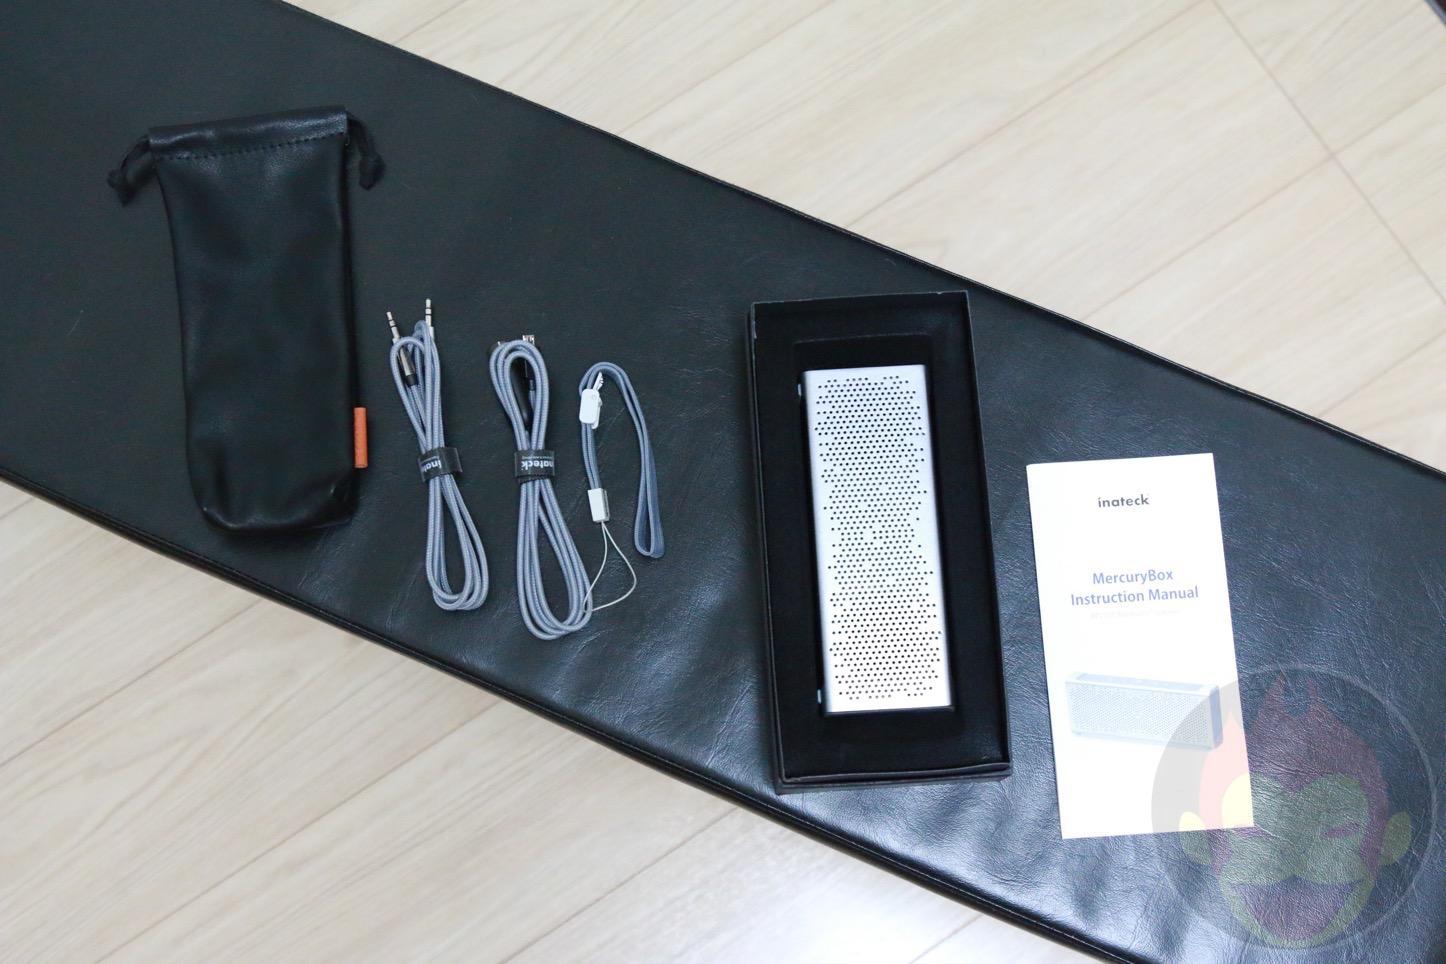 Inateck-Bluetooth-Speaker-05.JPG